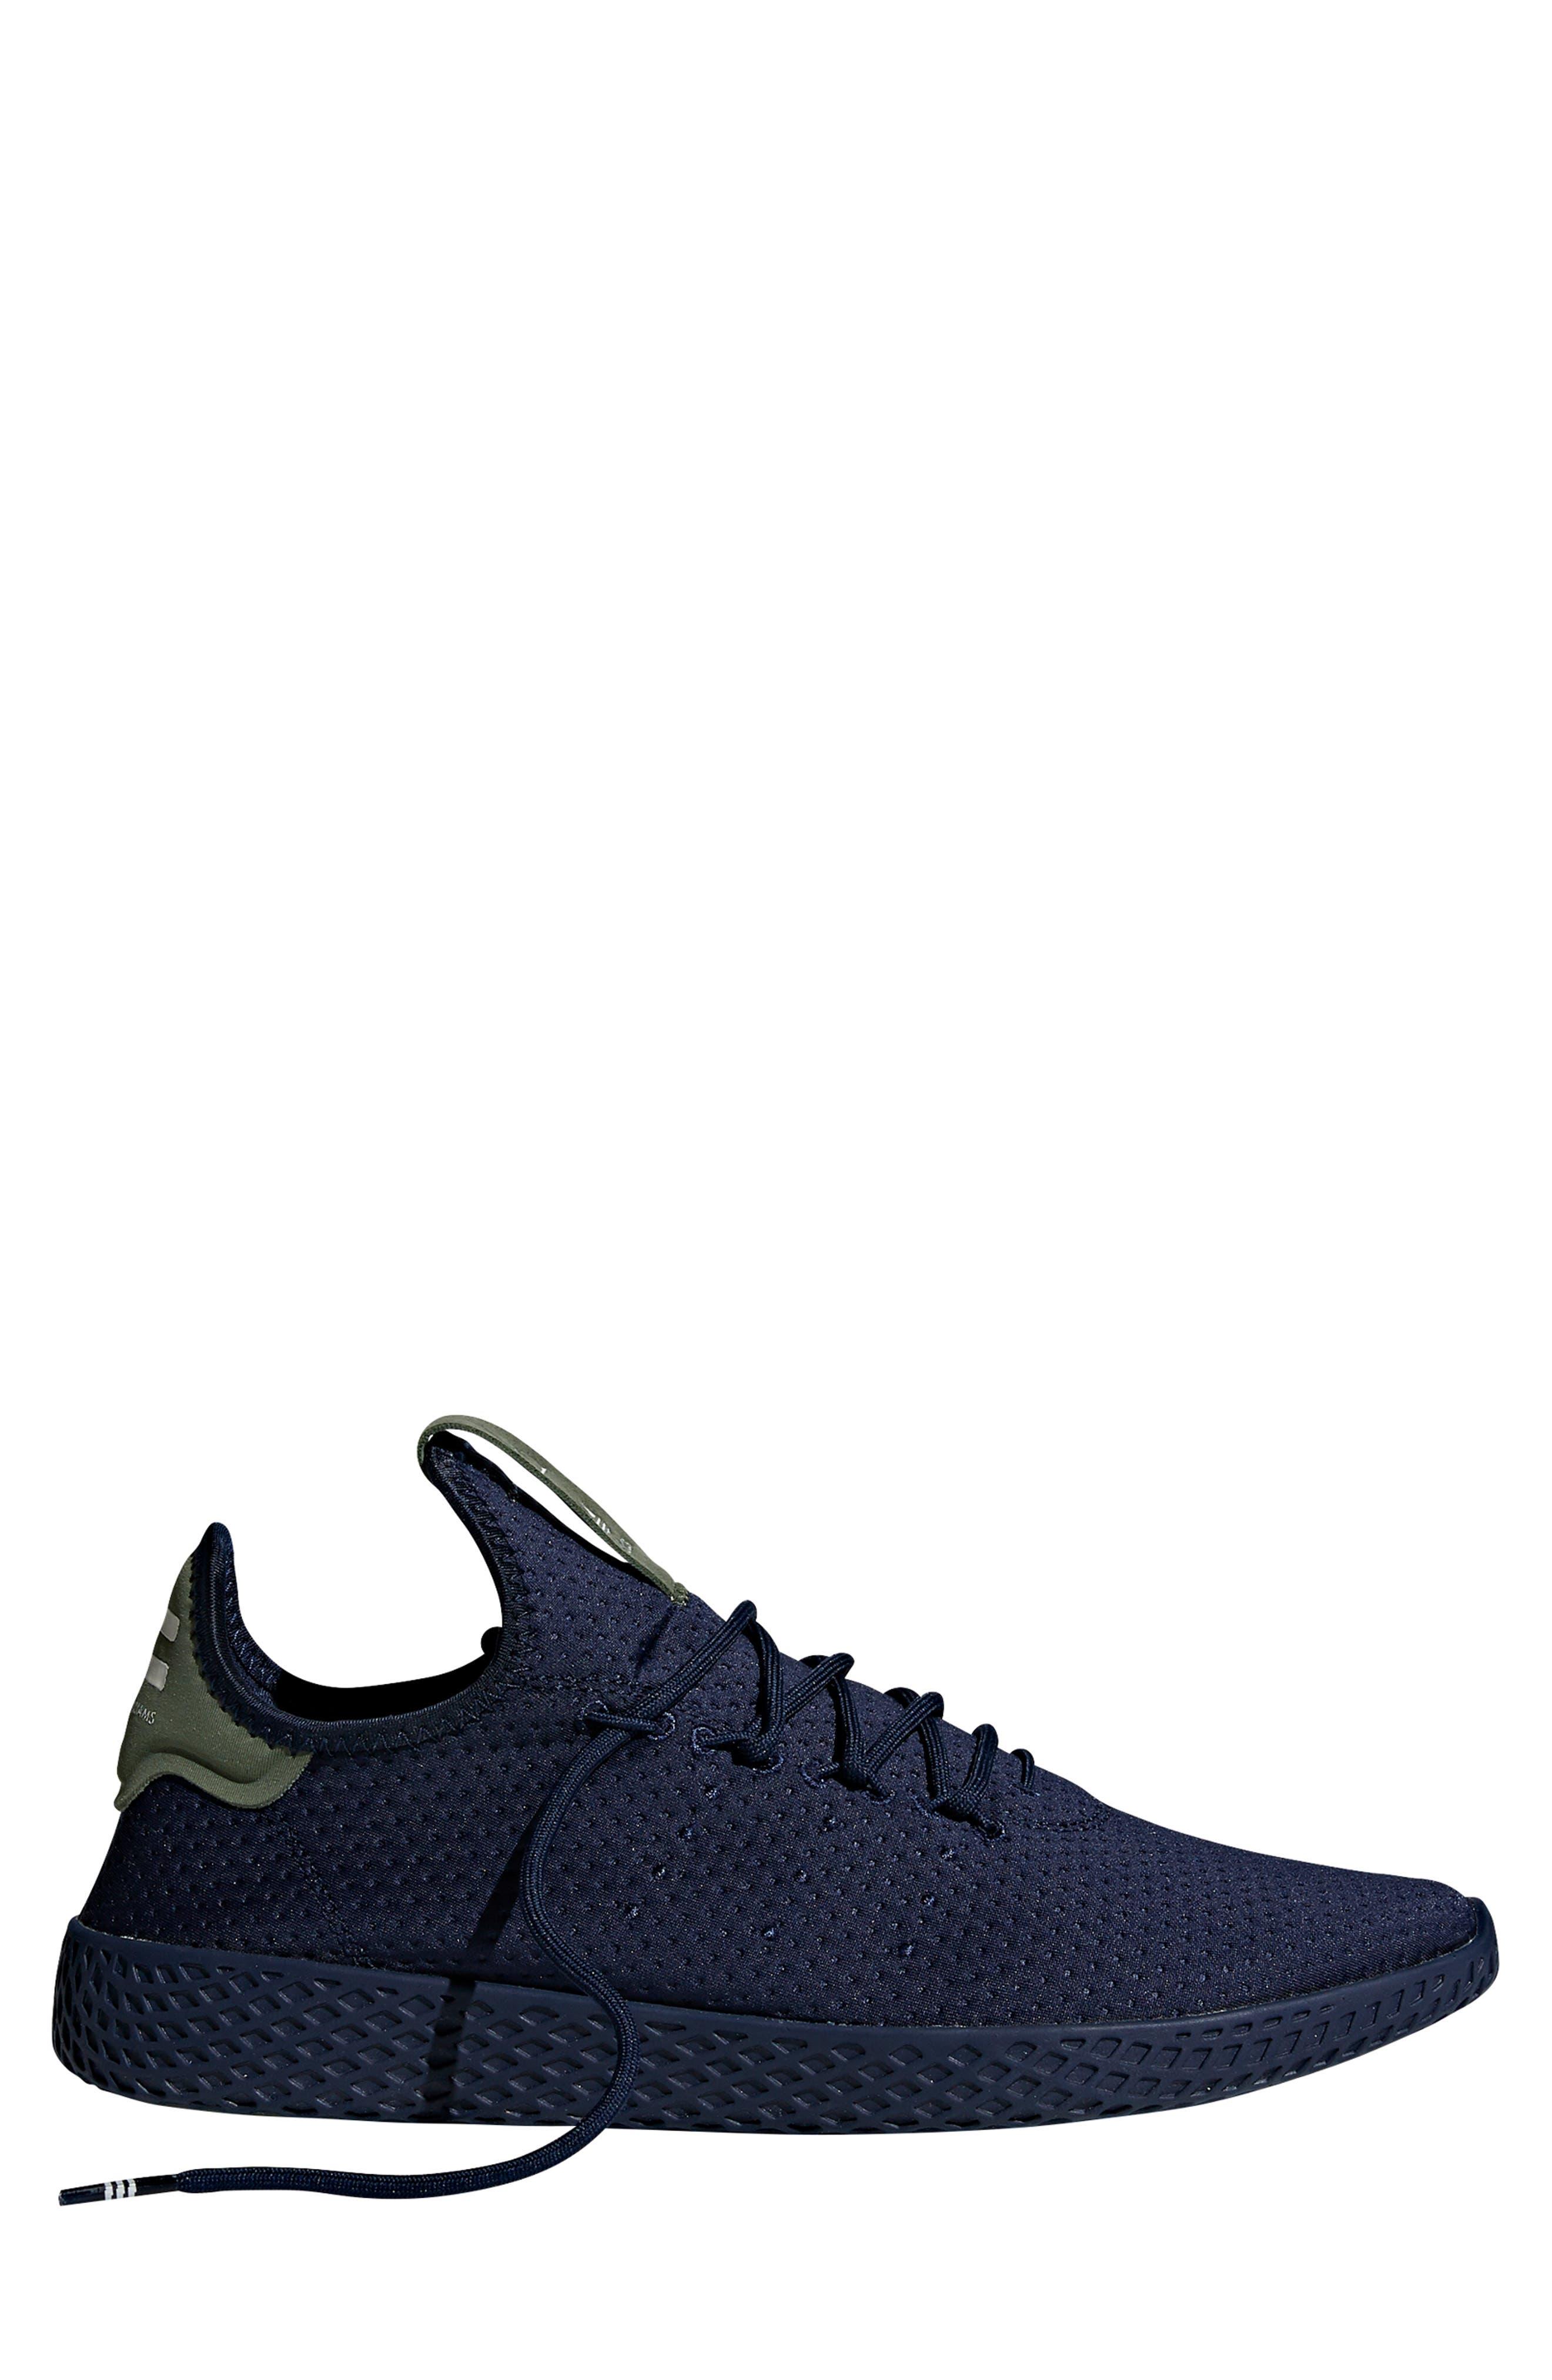 Pharrell Williams Tennis Hu Sneaker,                             Alternate thumbnail 8, color,                             415